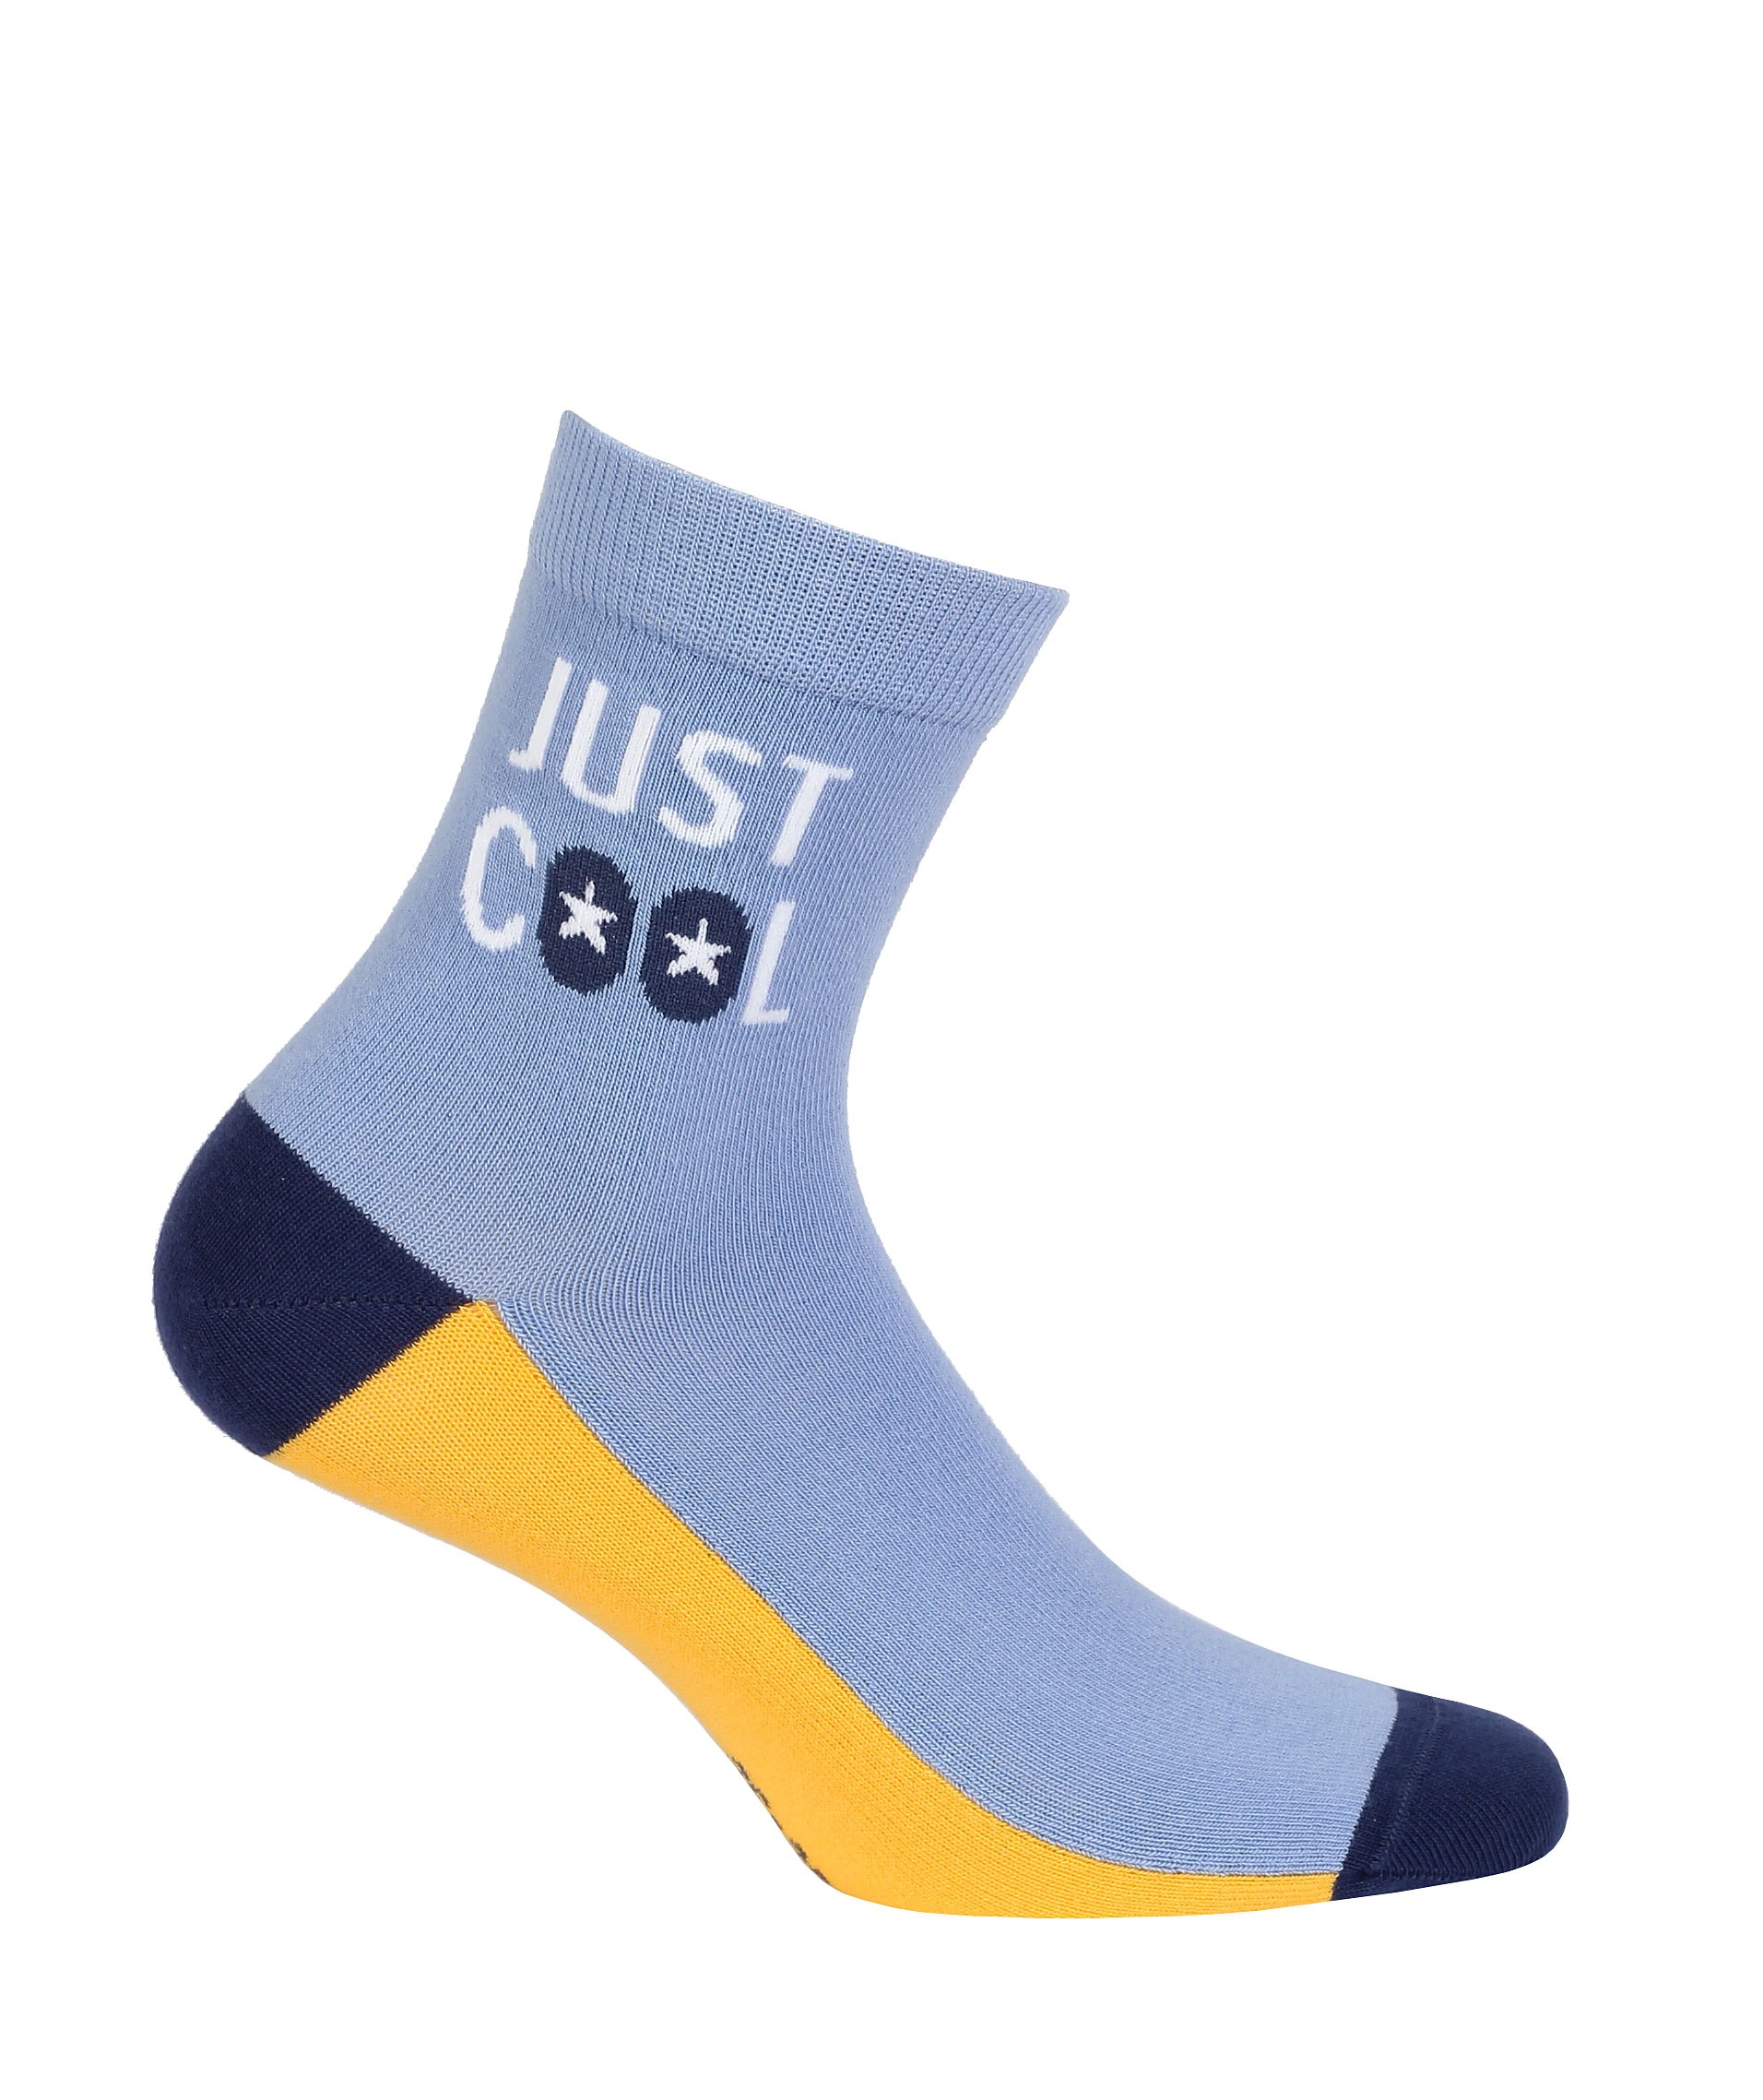 dětské ponožky vzor GATTA JUST COOL 33-35